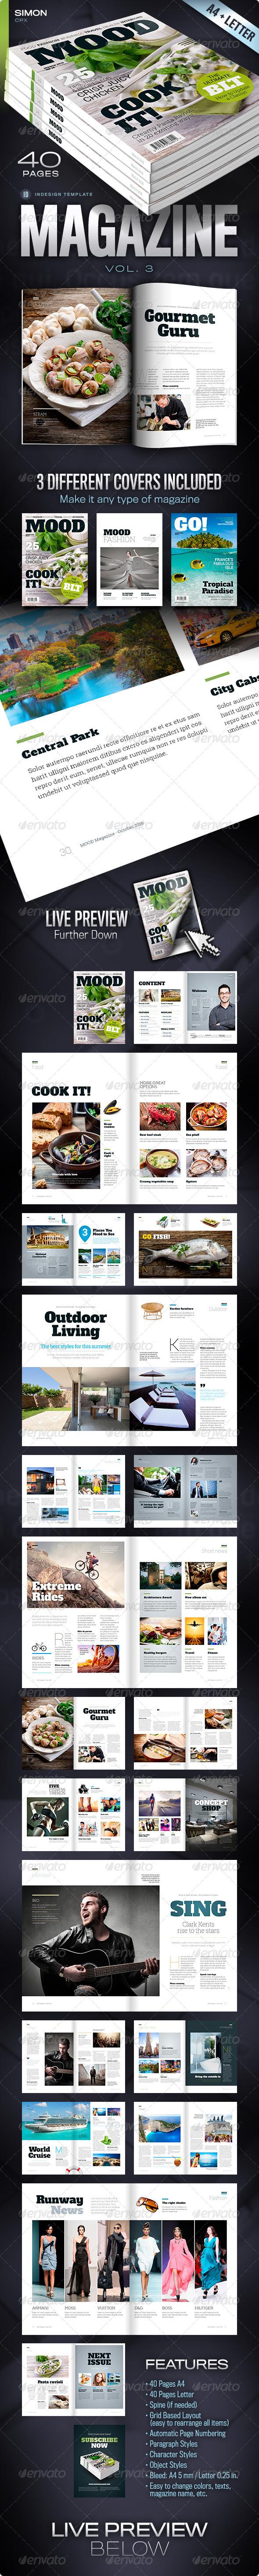 Magazine Vol. 3 - Magazines Print Templates